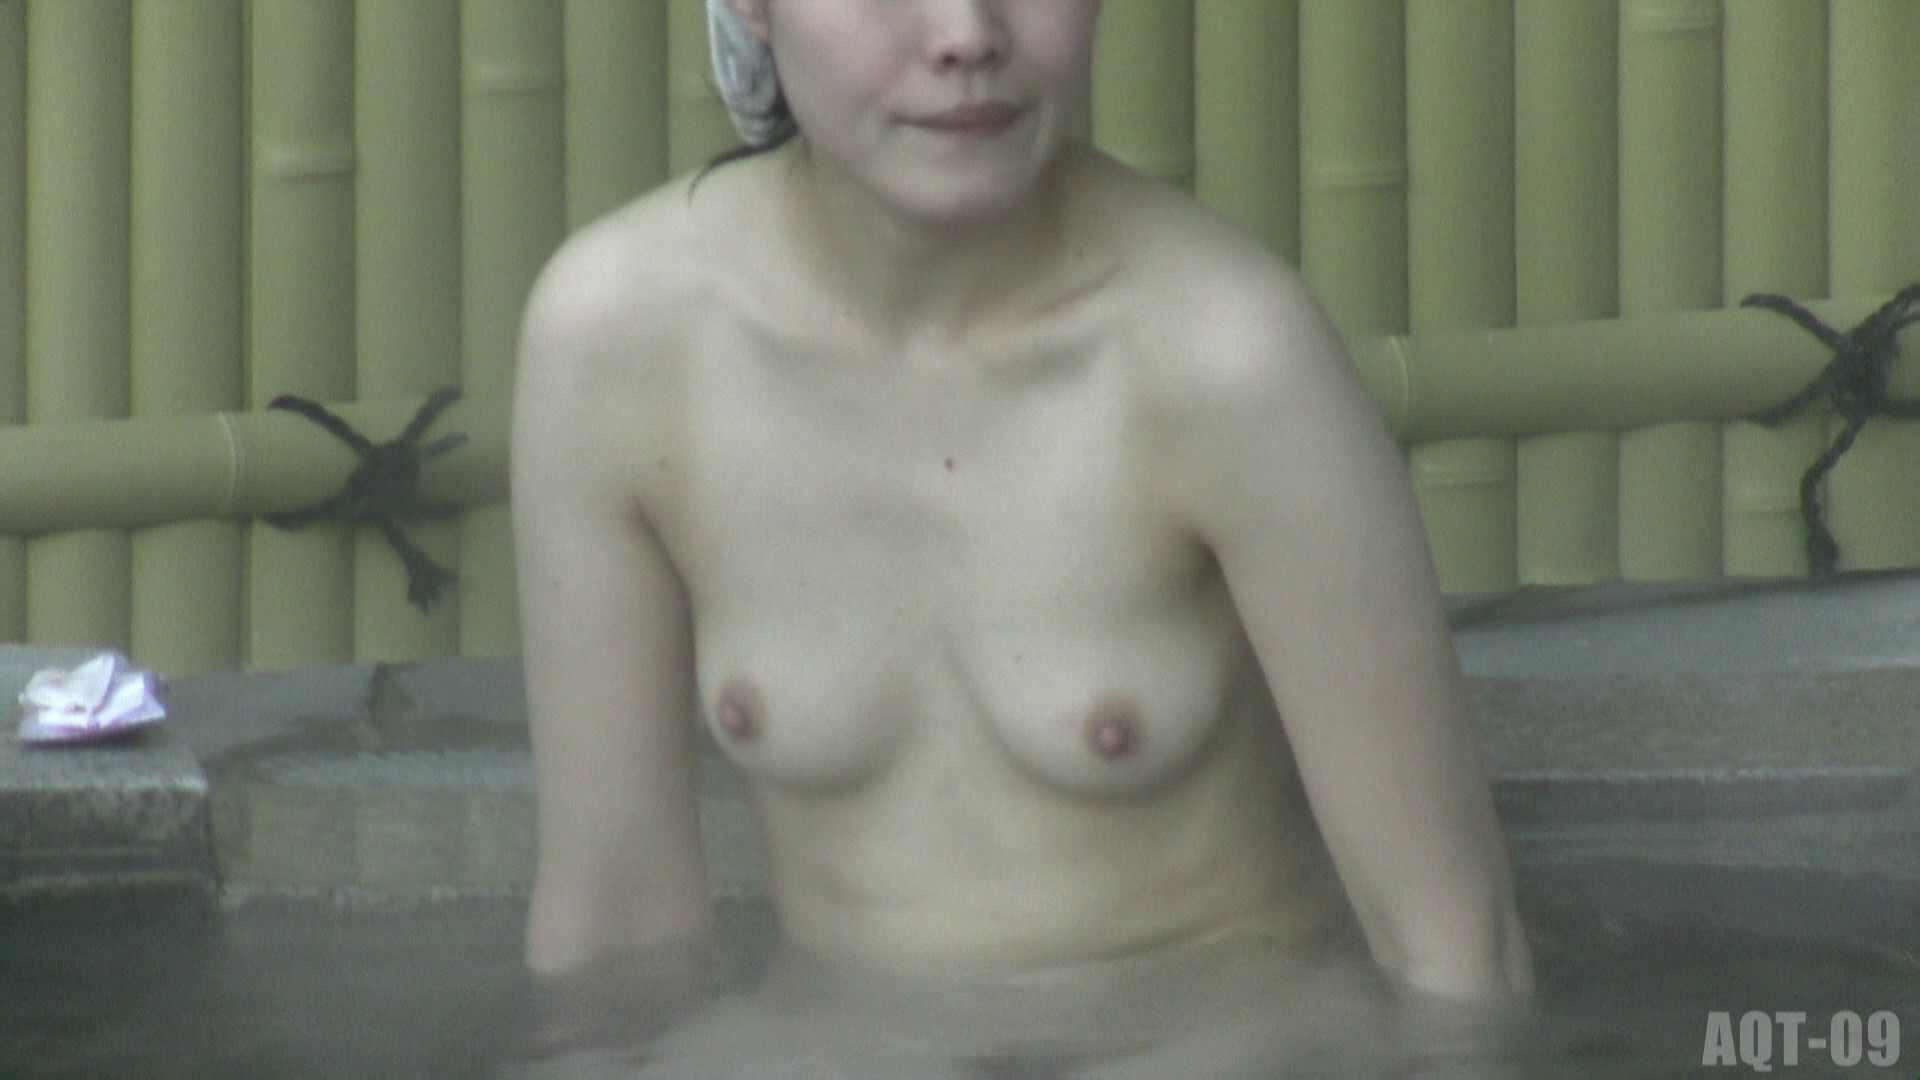 Aquaな露天風呂Vol.786 盗撮師作品  79pic 27